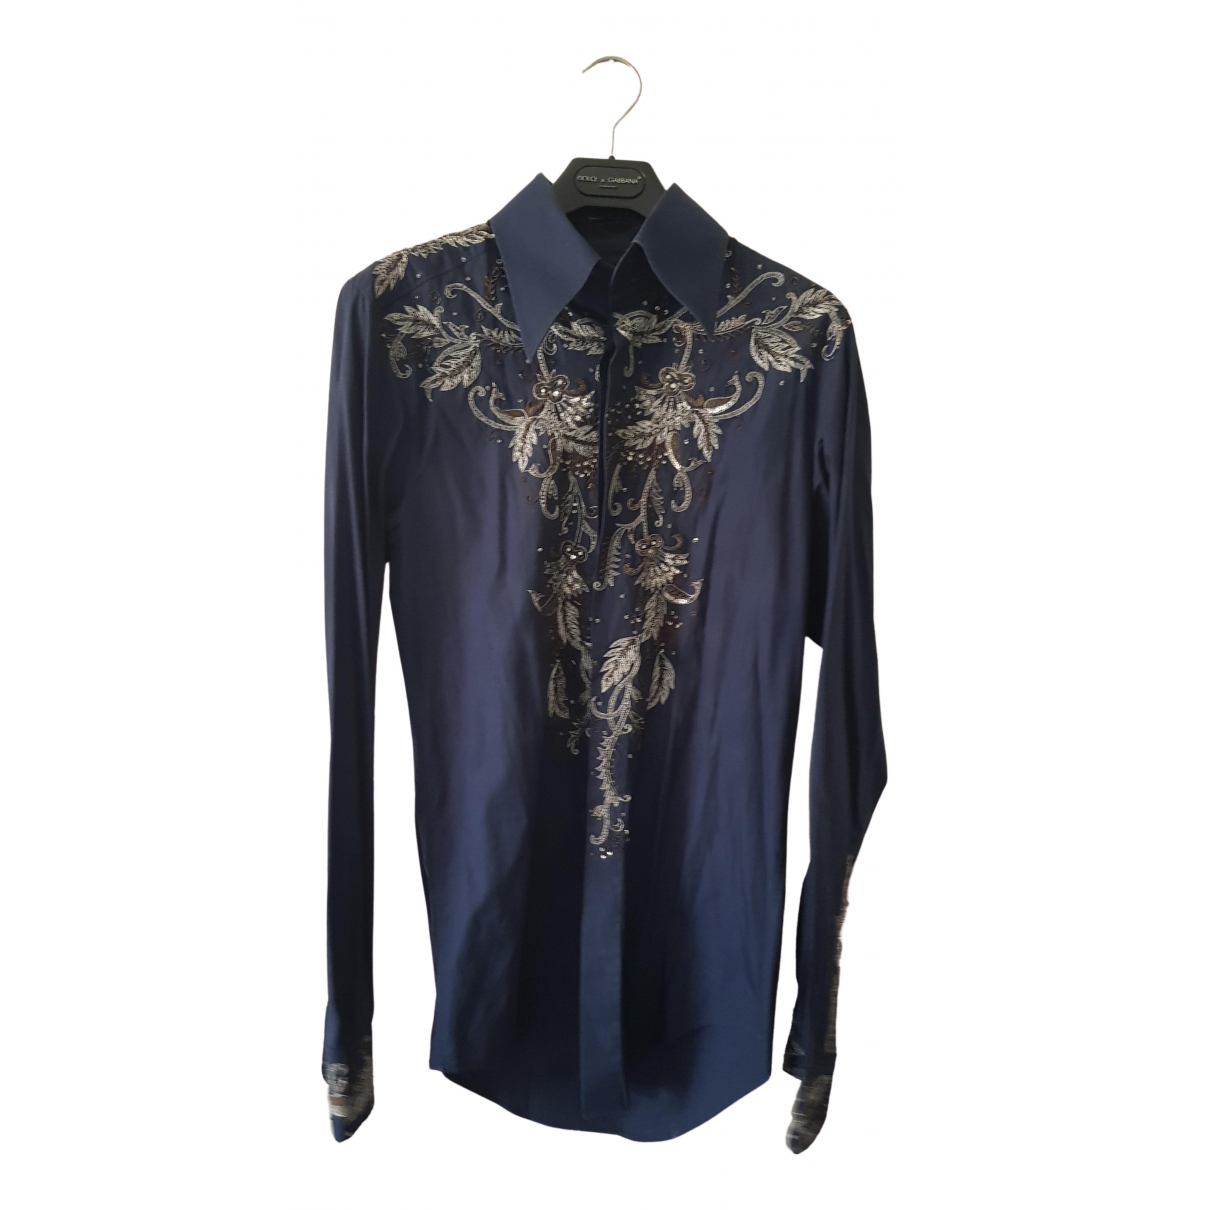 Dolce & Gabbana N Blue Cotton Shirts for Men 39 EU (tour de cou / collar)